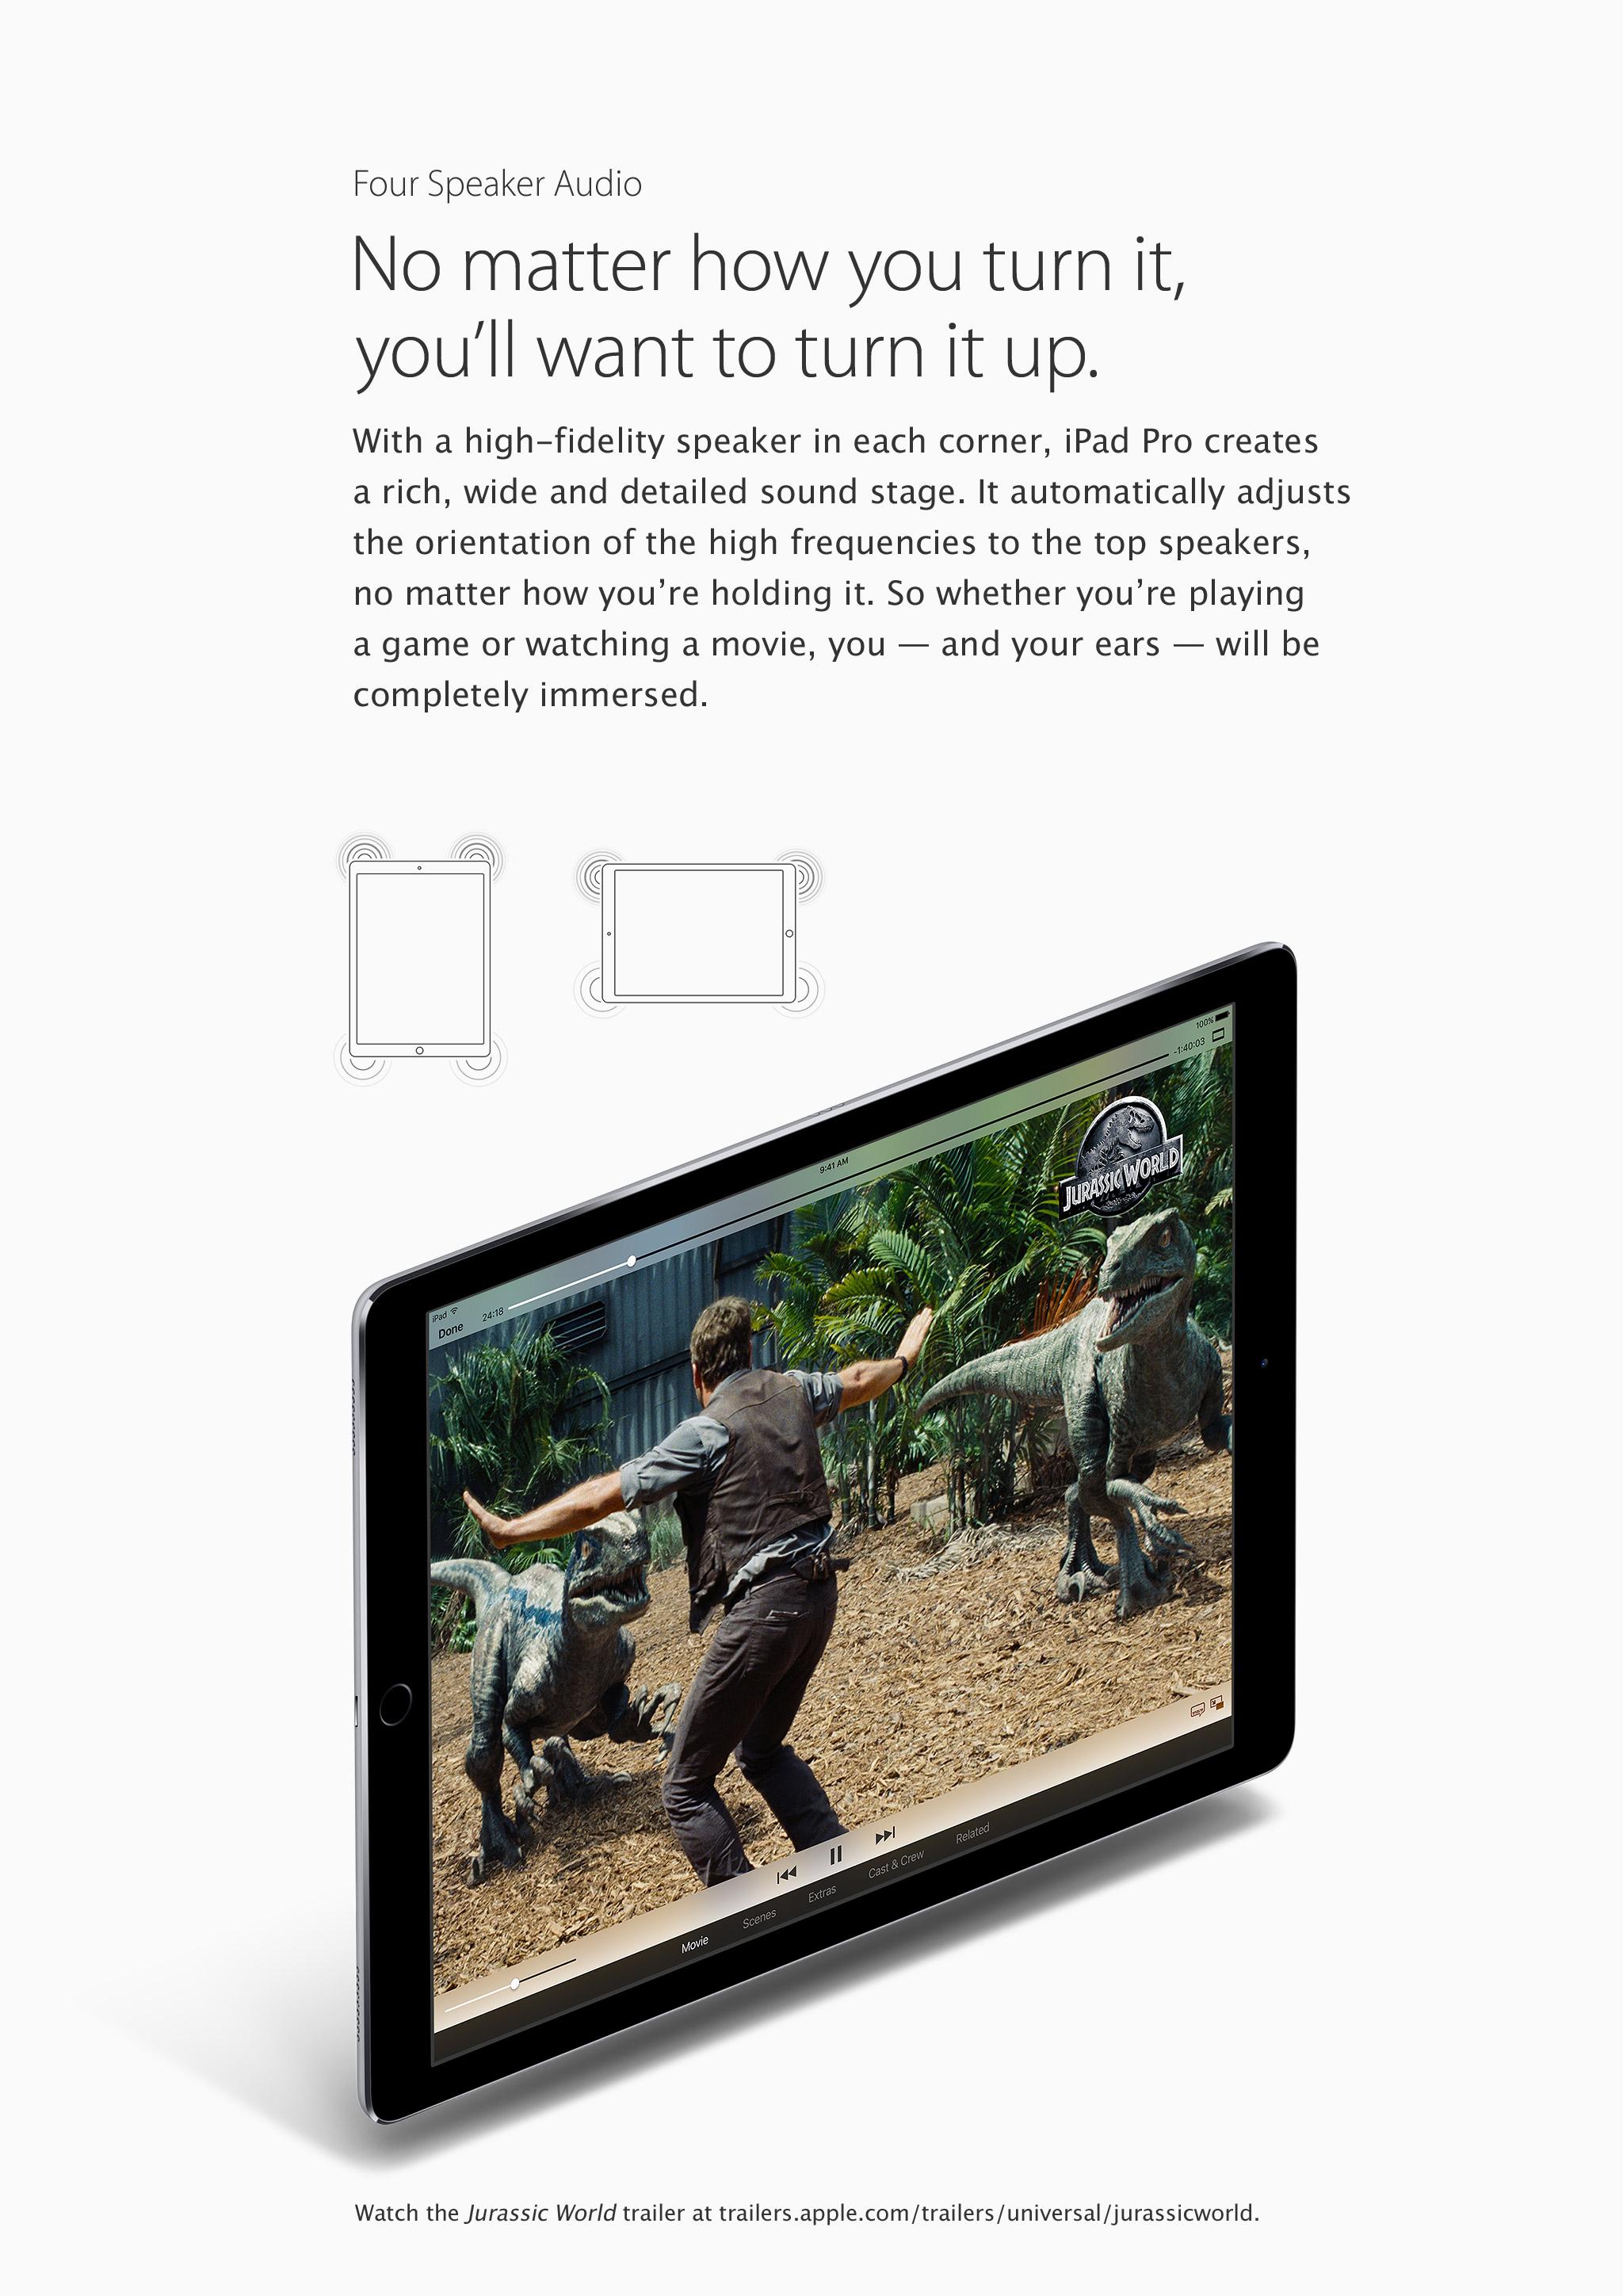 iPad Pro features